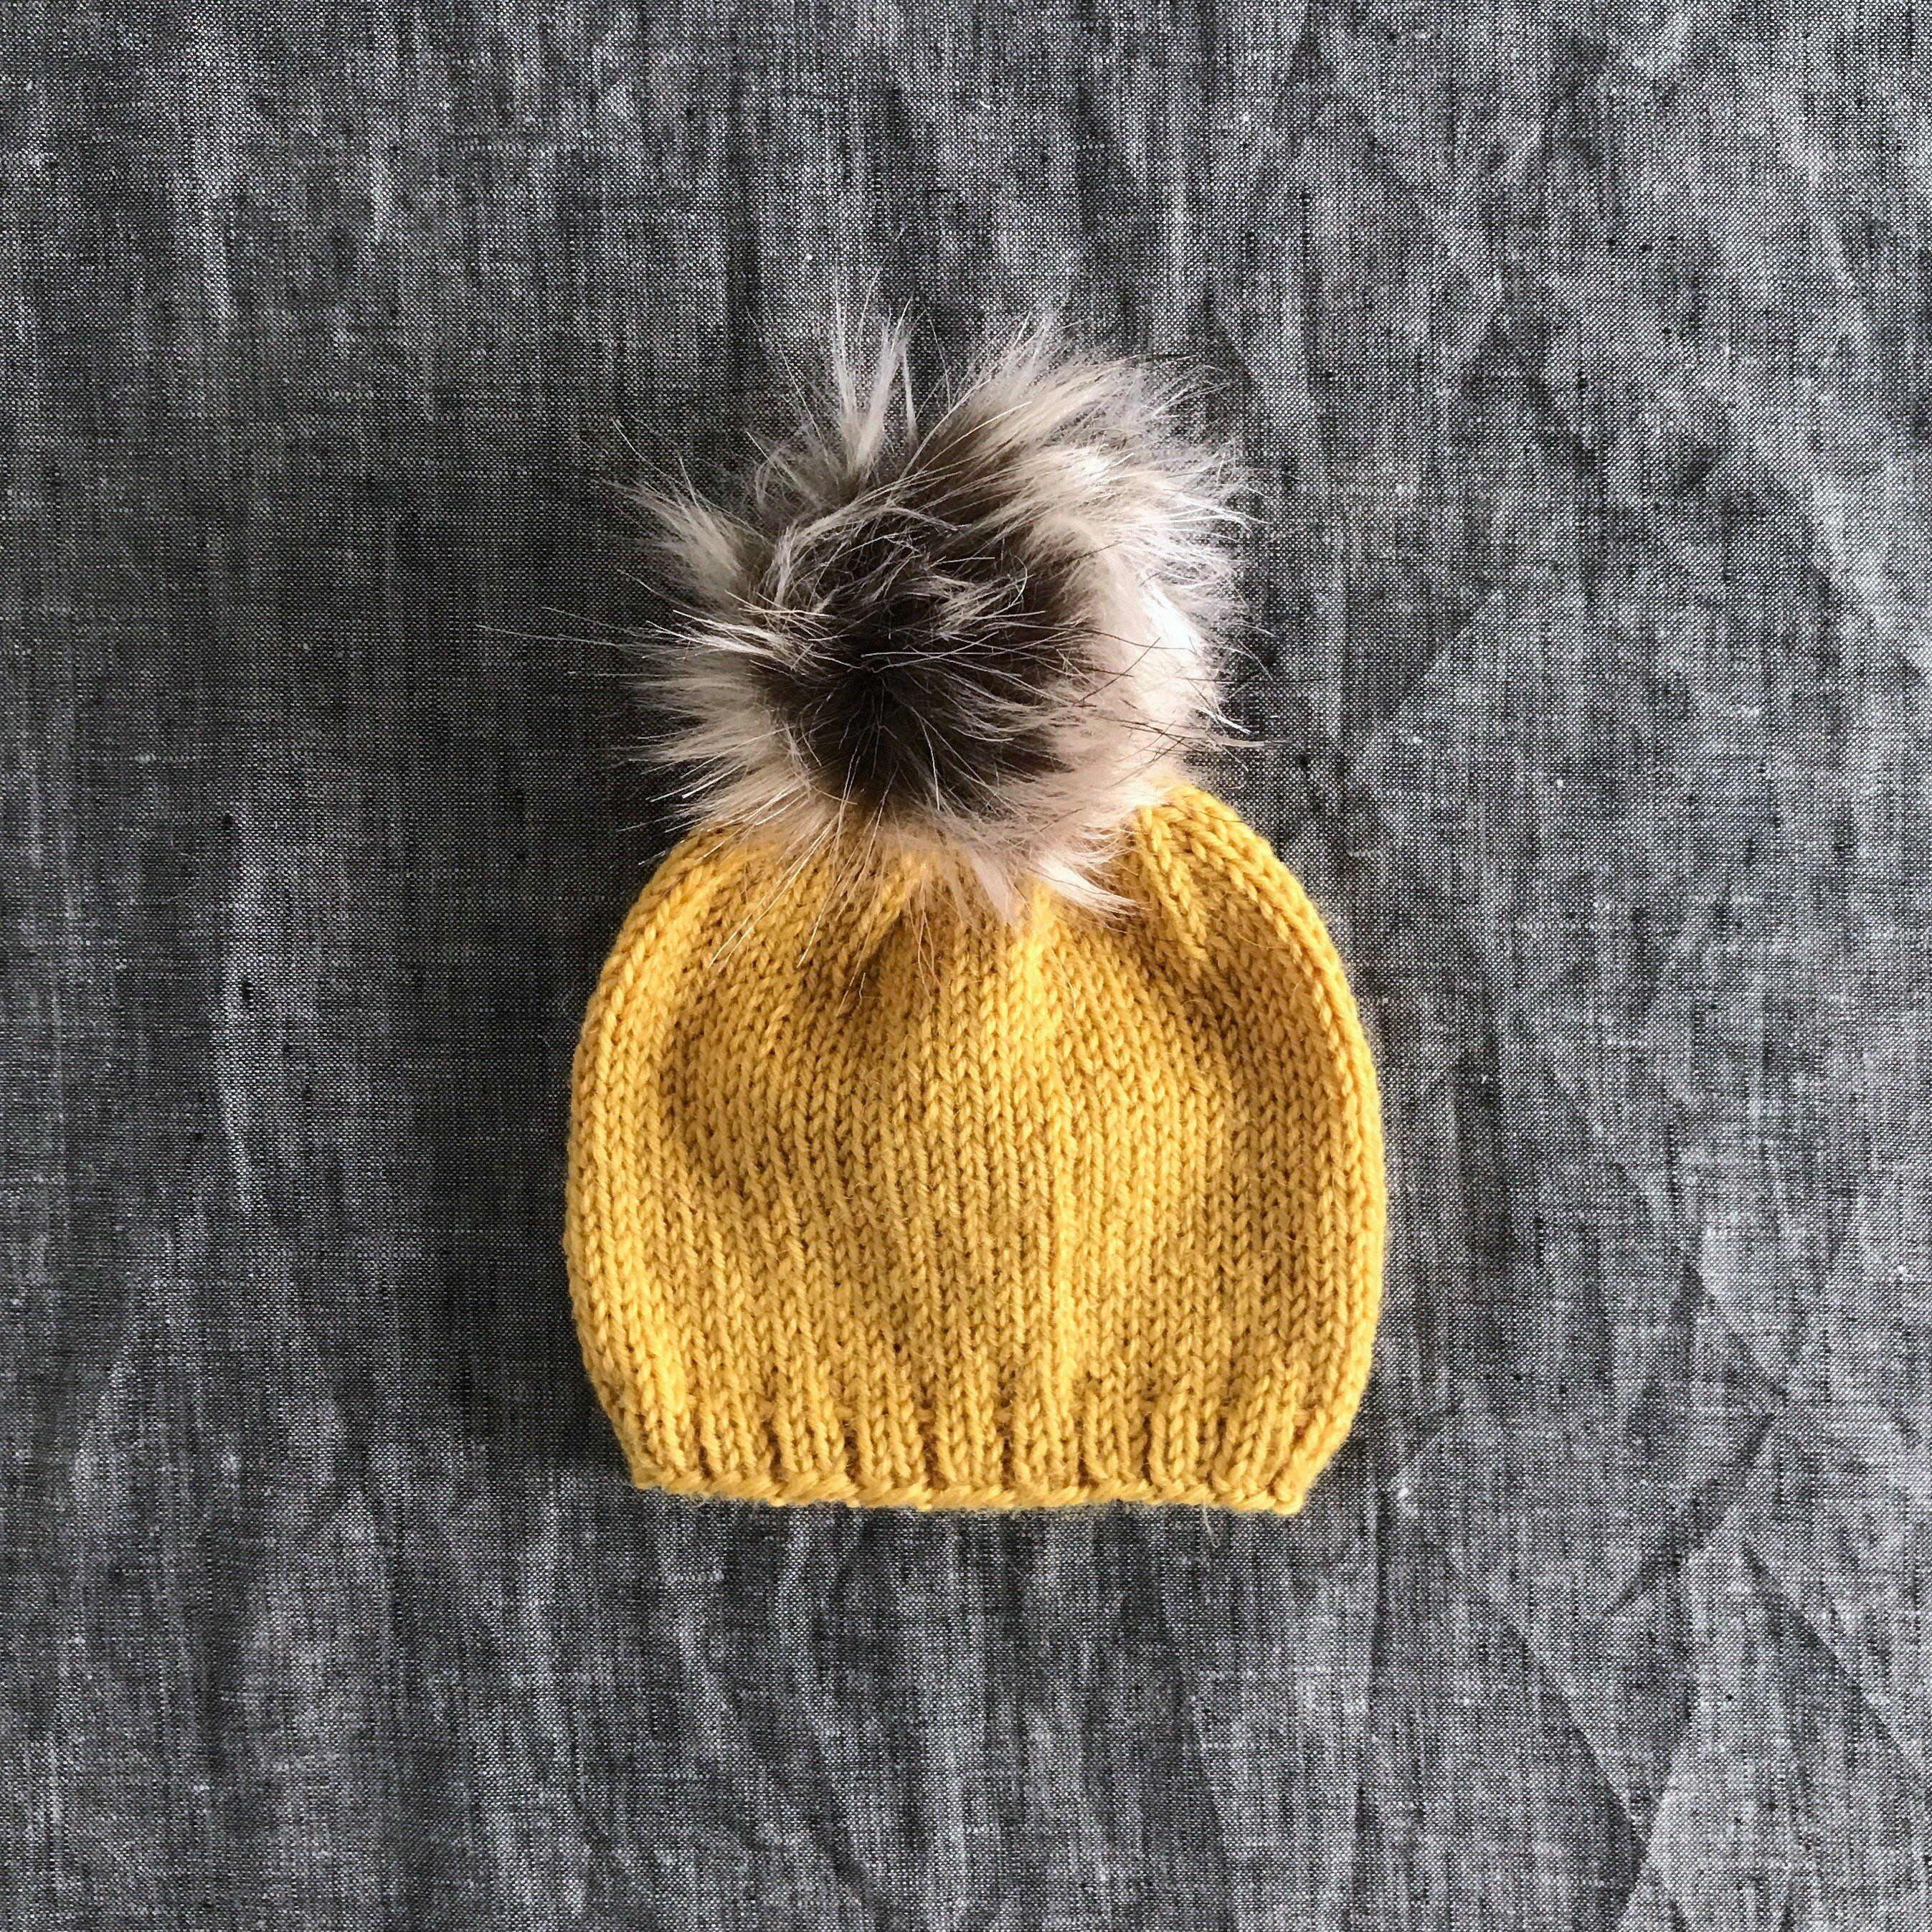 Mustard Baby Beanie with Faux Fur Pompom - 3 Month Size  accessories  hat   babyshower  mustardbabybeanie  fauxfurpompomhat e6d01cb9600